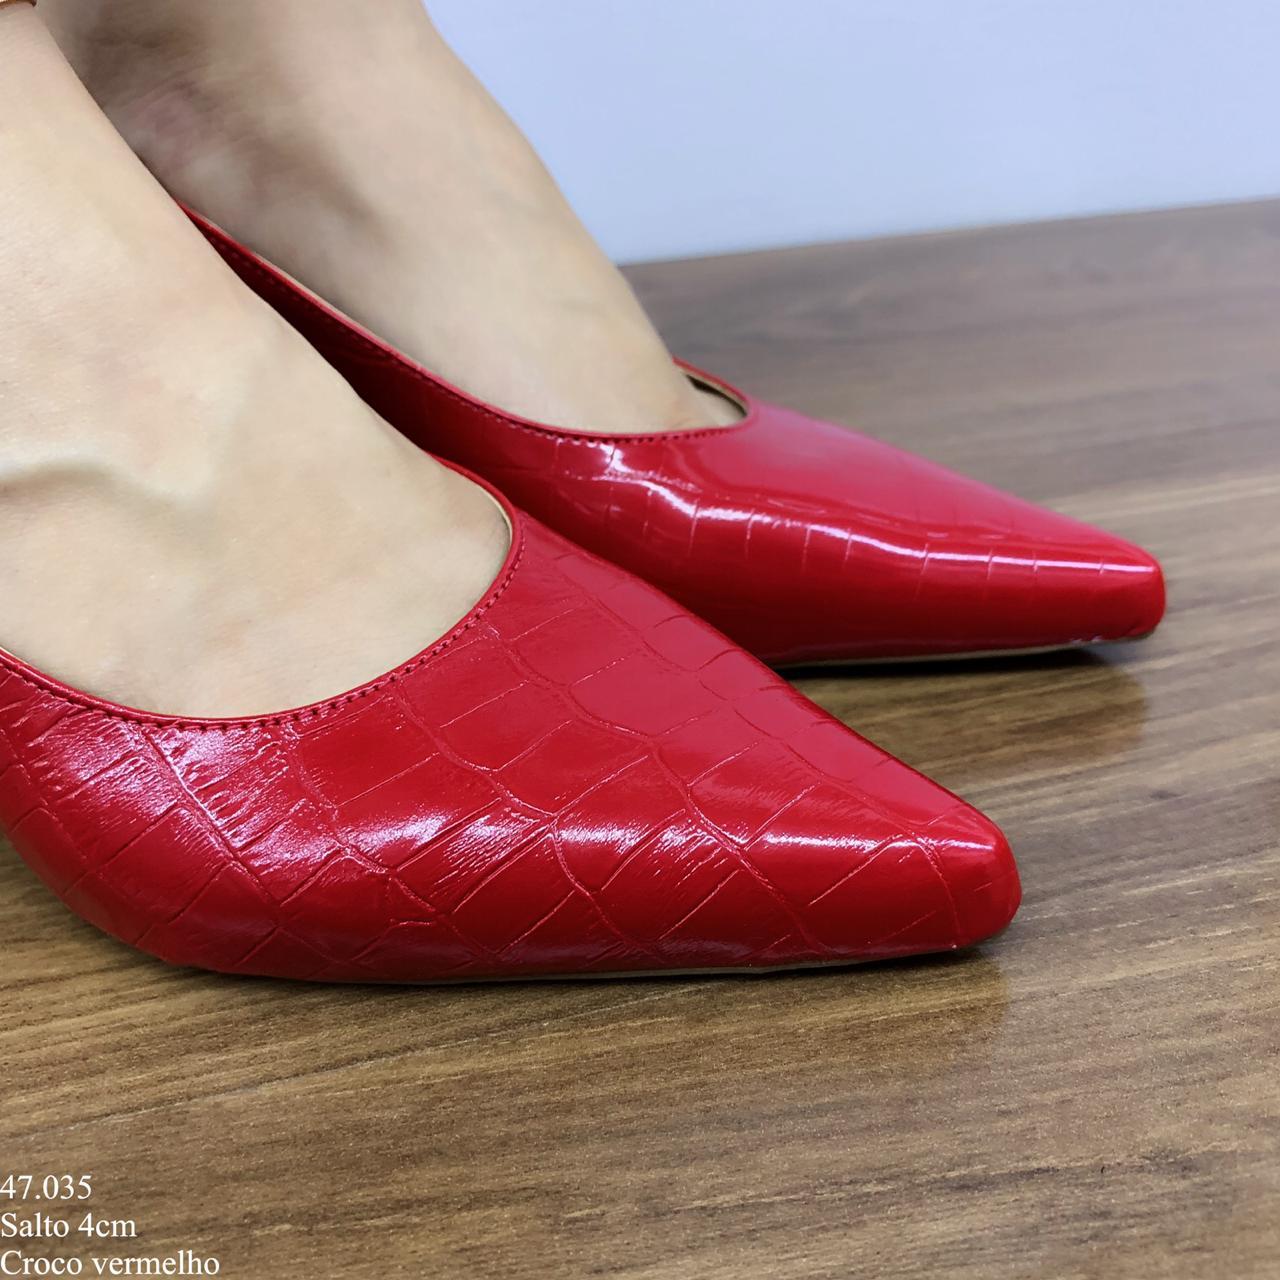 Scarpin Chanel Vermelho Croco | D-47.035